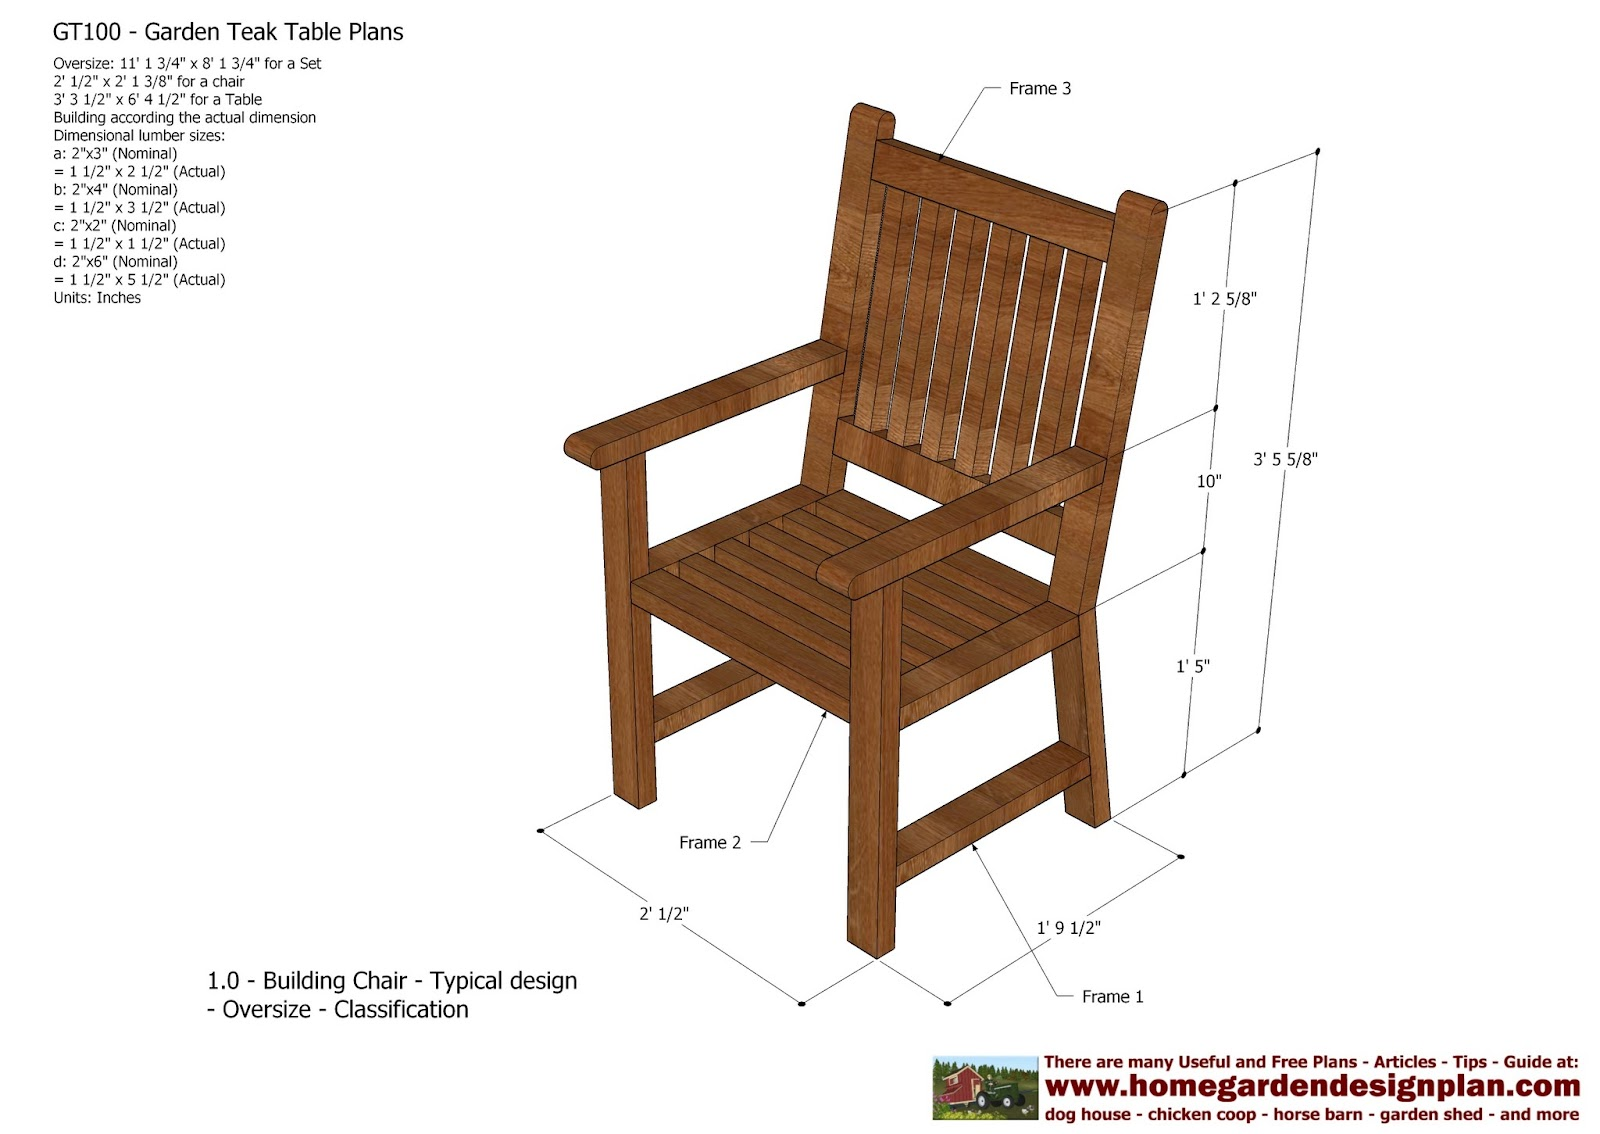 Design Chair Outdoor Ergonomic Test Home Garden Plans Gt100 Teak Tables